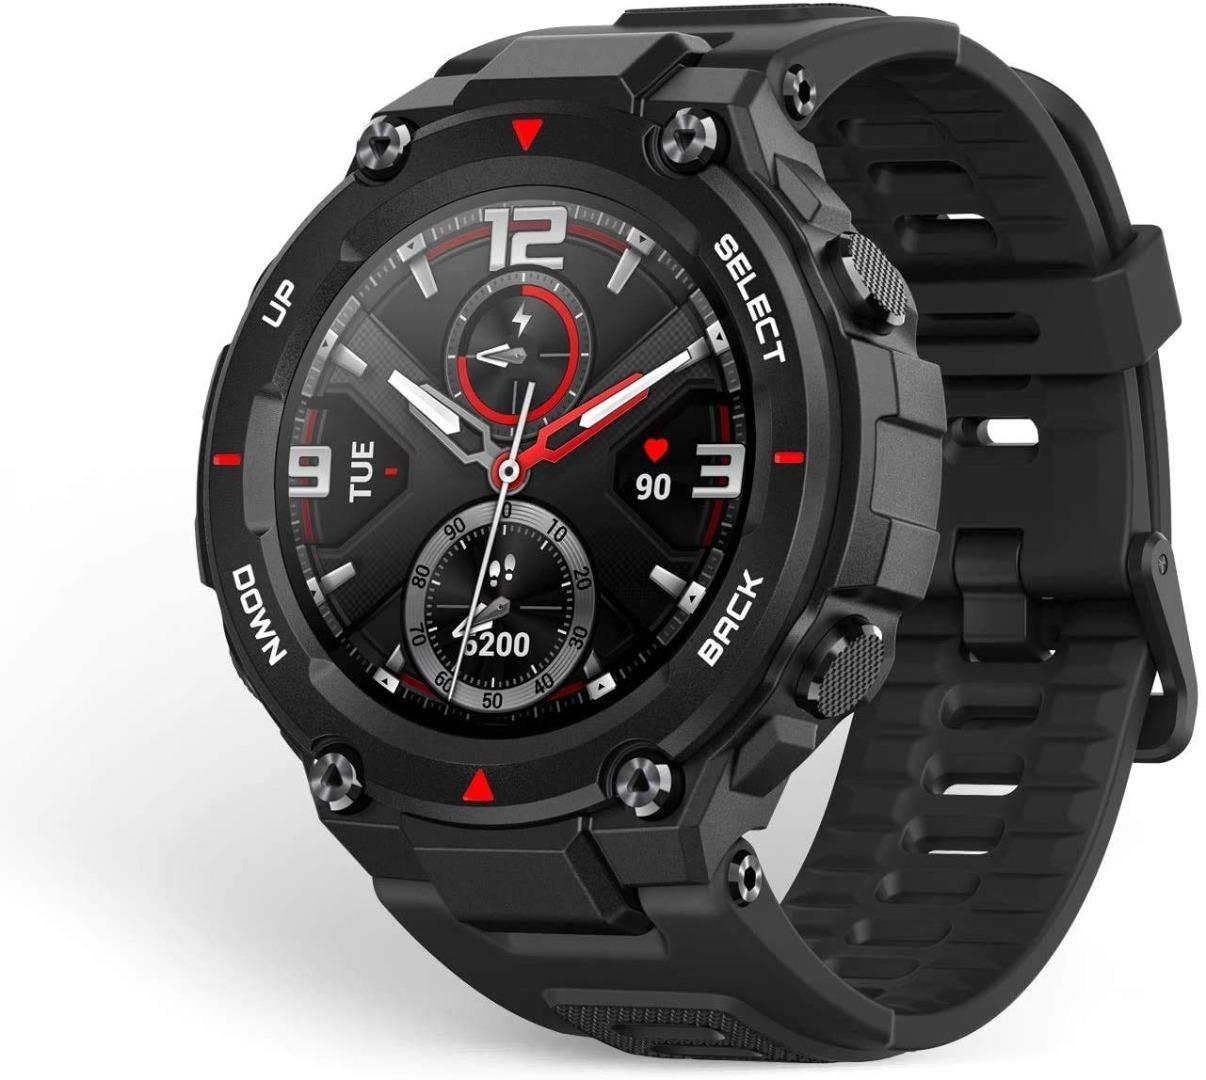 Fossil Sport Unisex Smartwatch